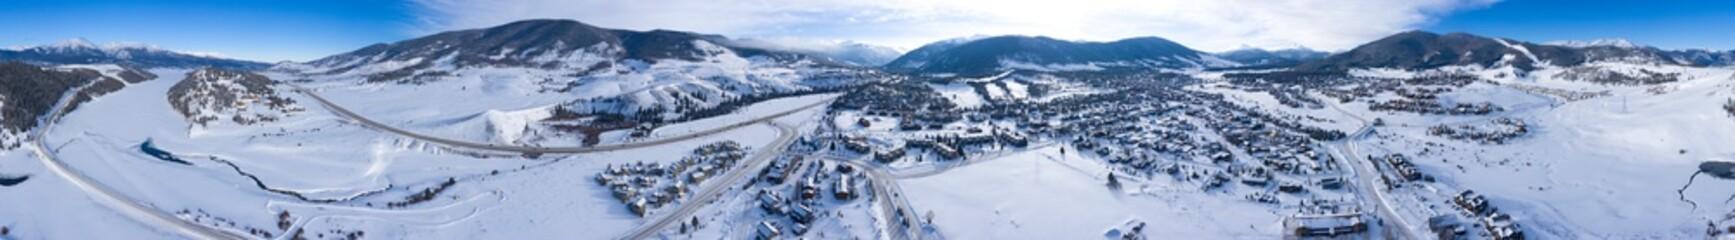 DIllon Siverthorne Colorado 360 Aerial Panoramic View Fototapete